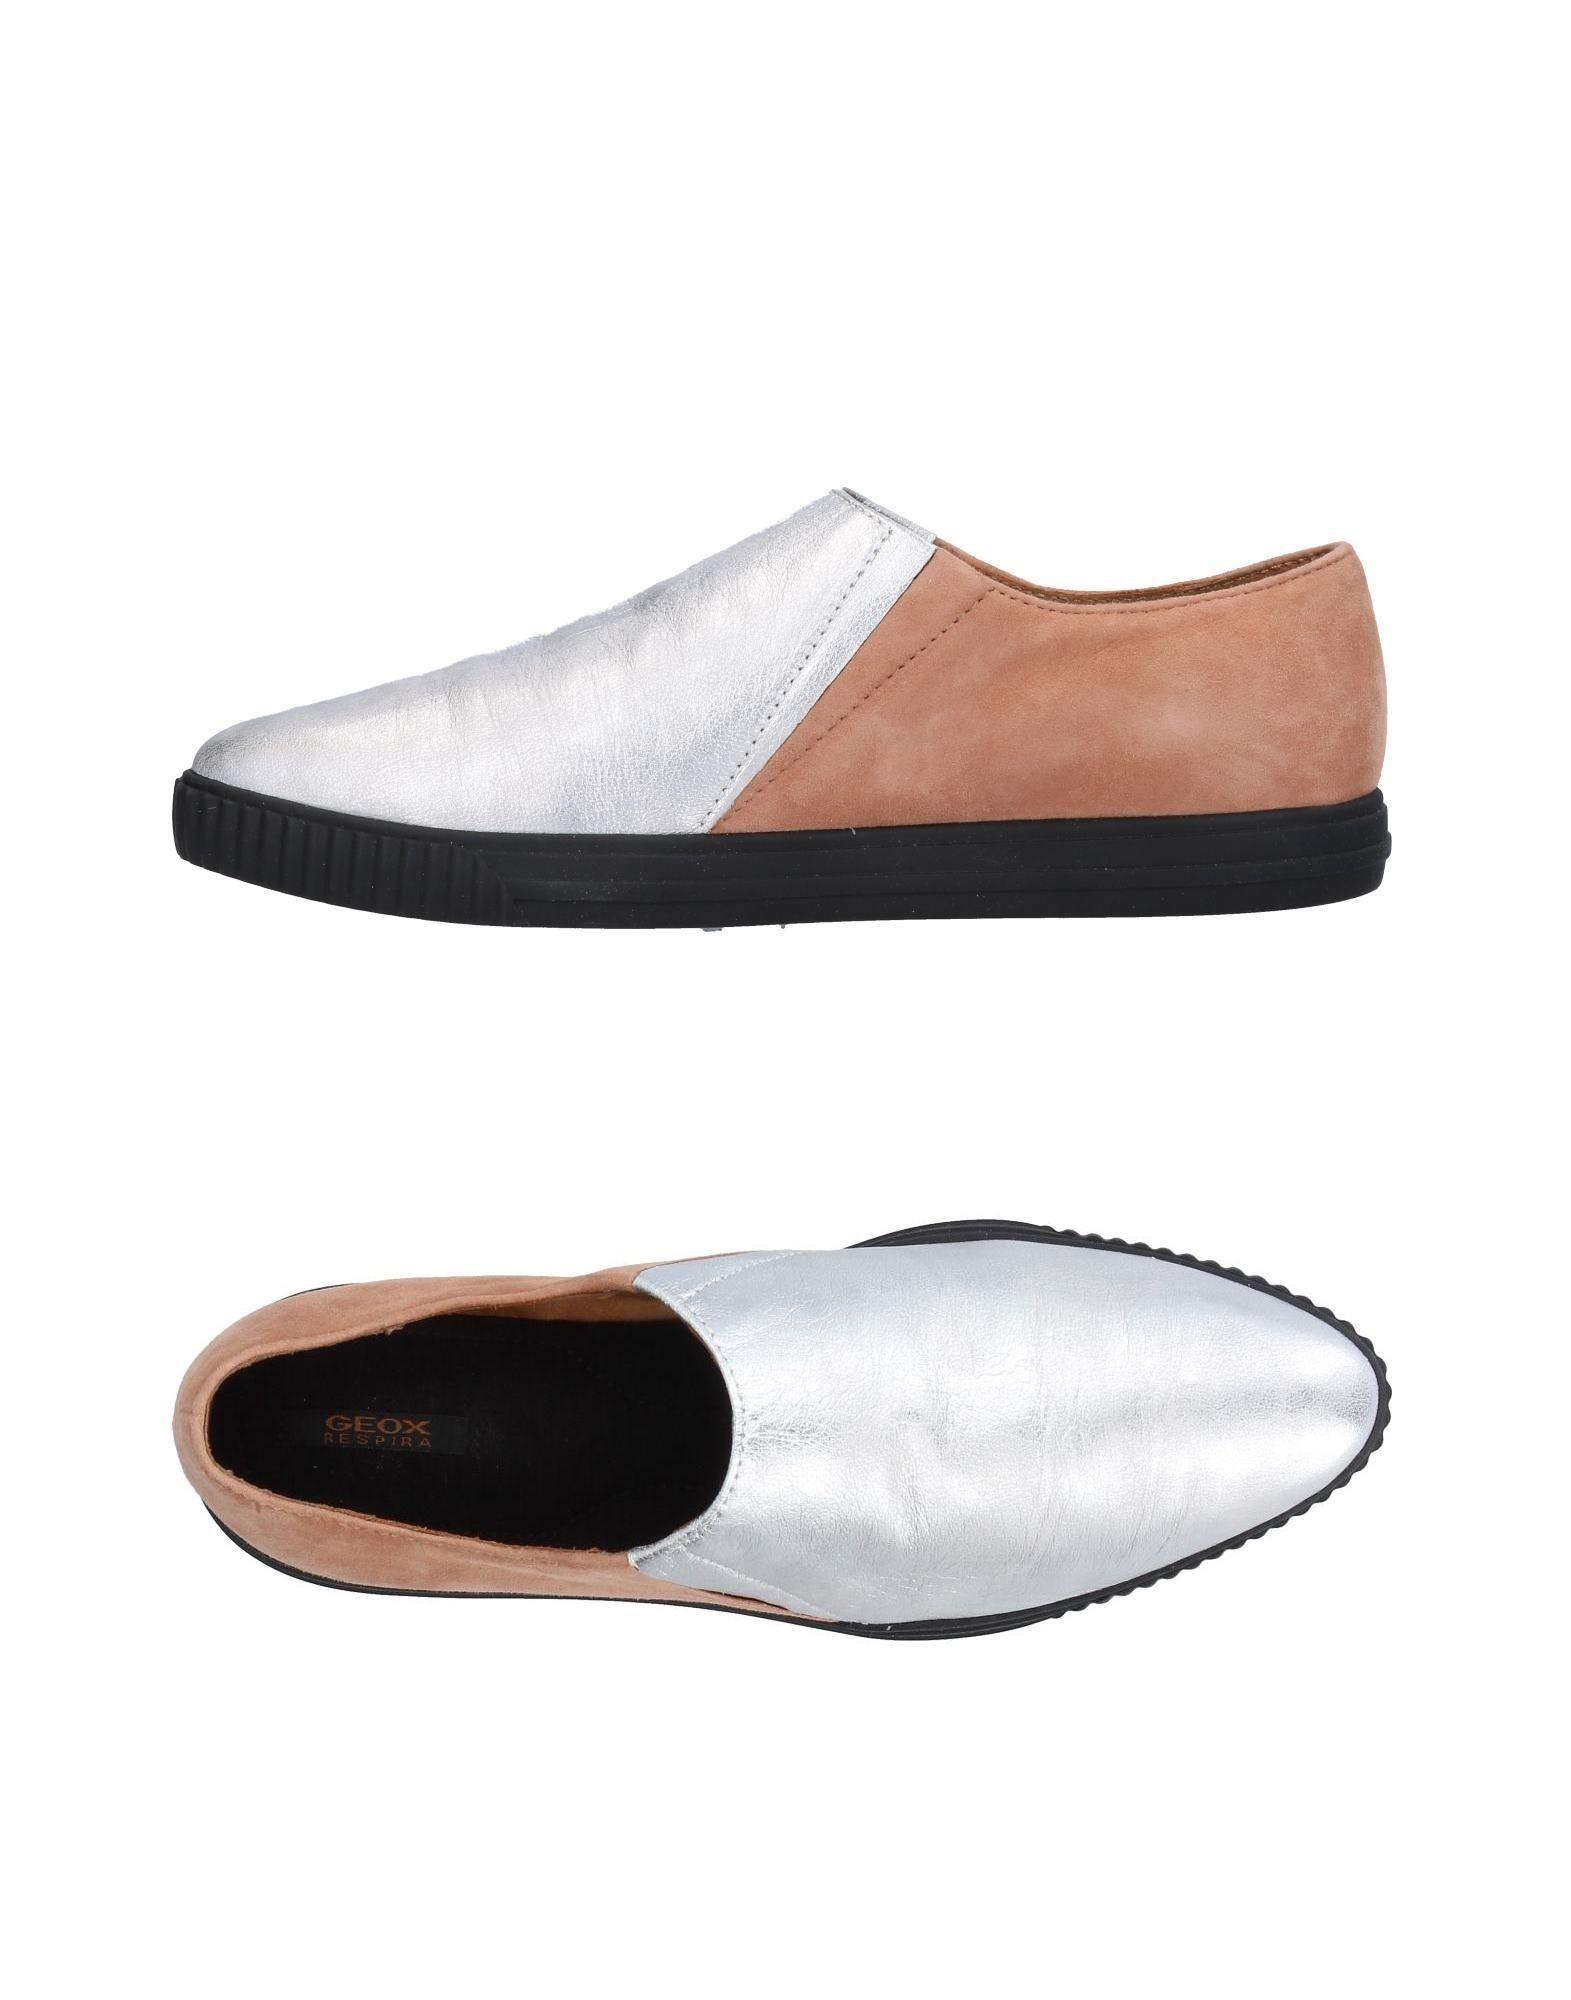 Geox Sneakers Damen  11413912RW Gute Qualität beliebte Schuhe